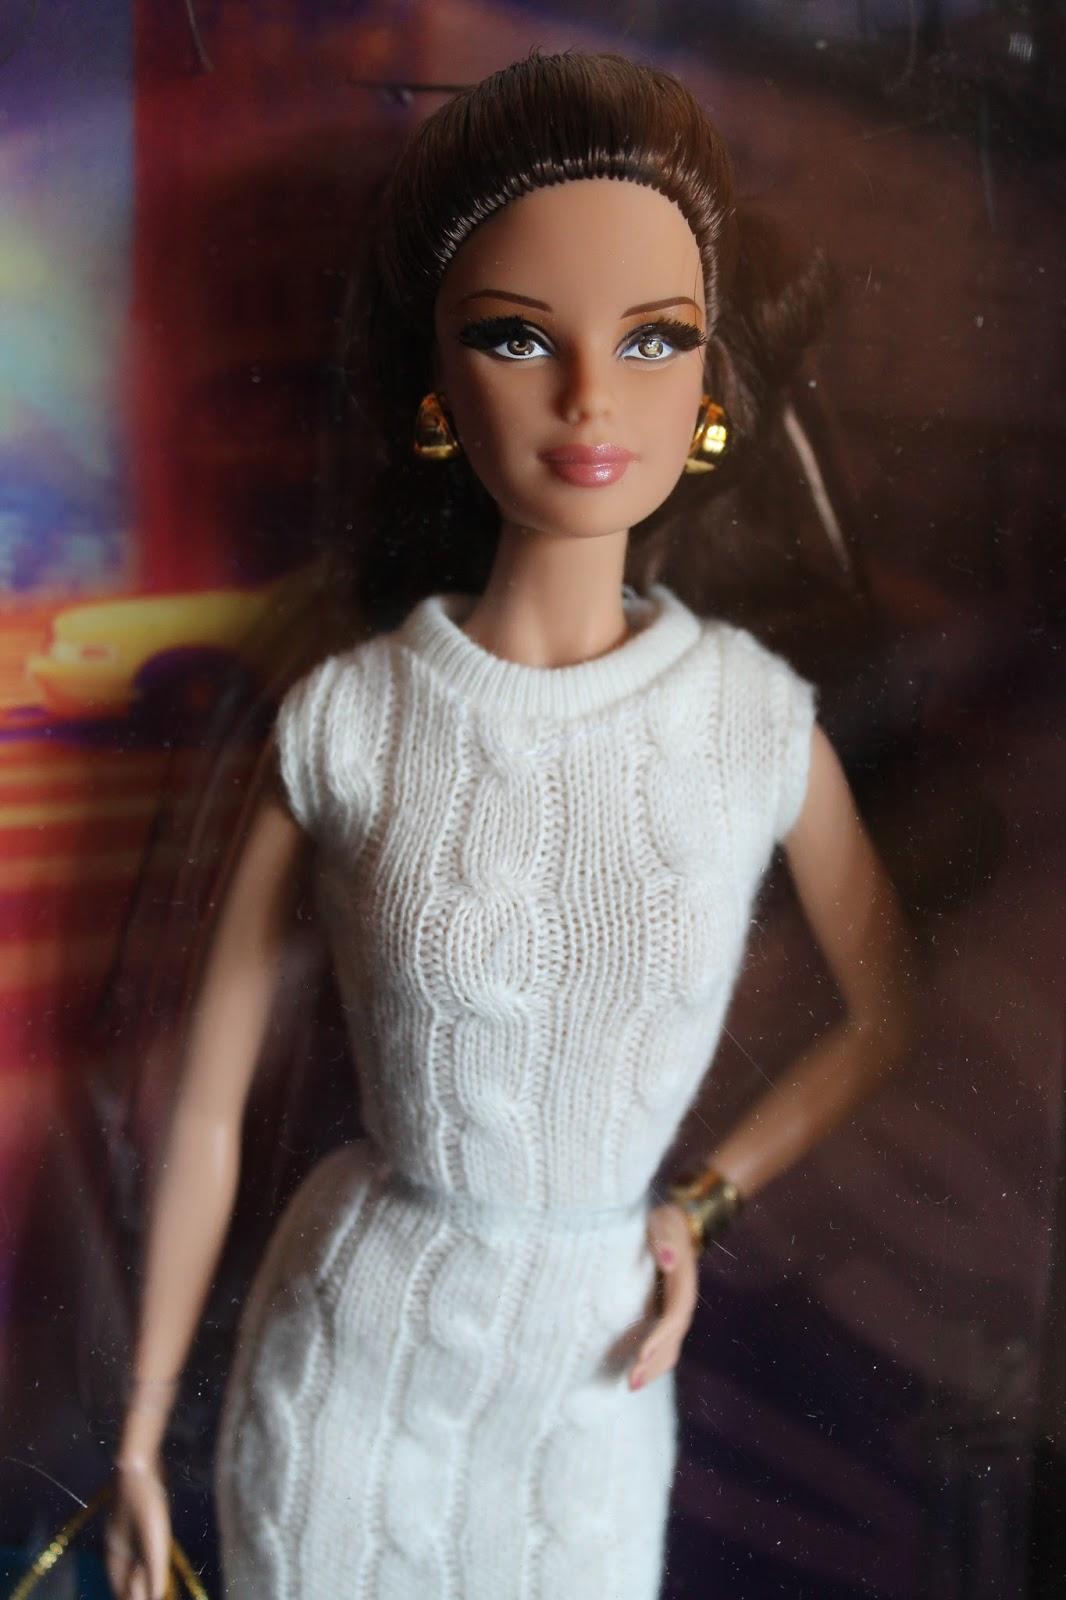 barbie-look-city-shopper-brunette